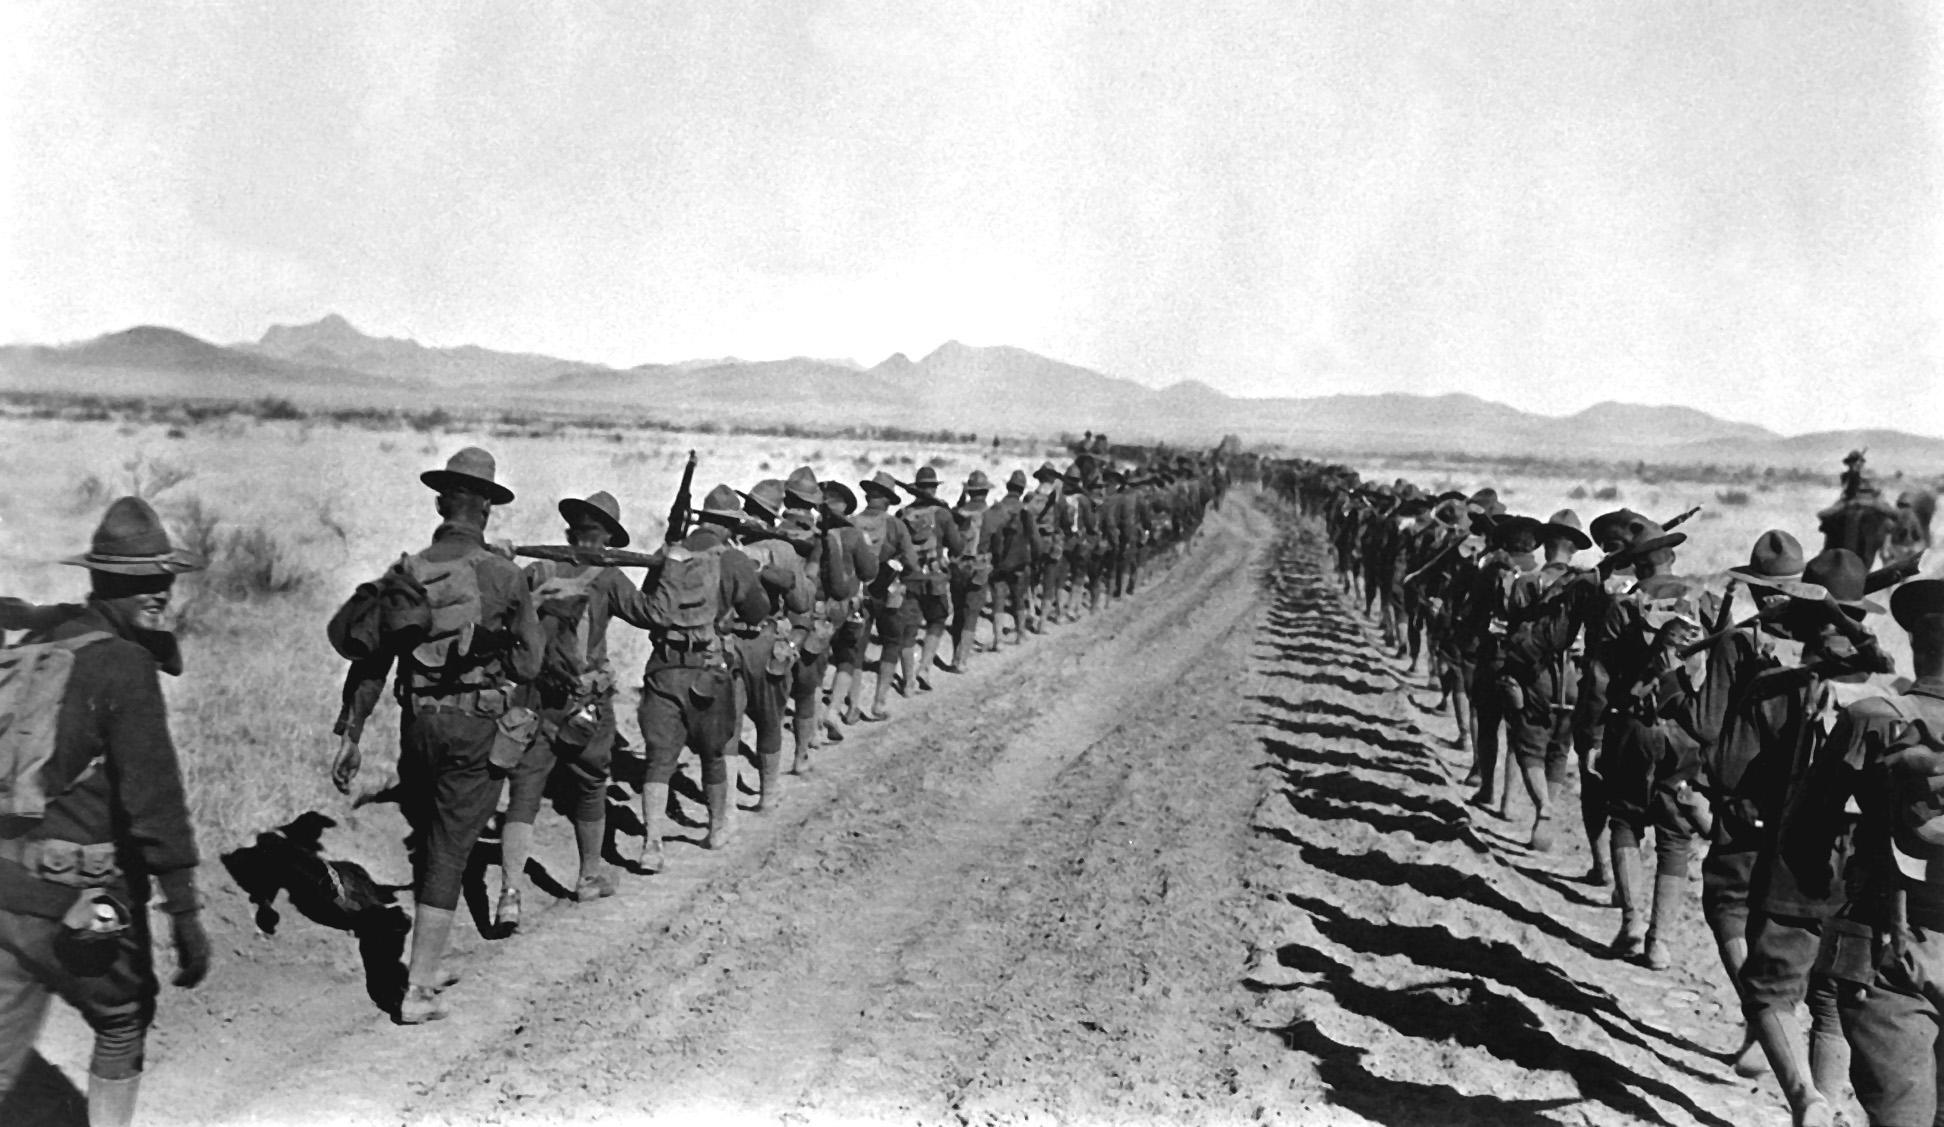 6th Infantry Regiment United States